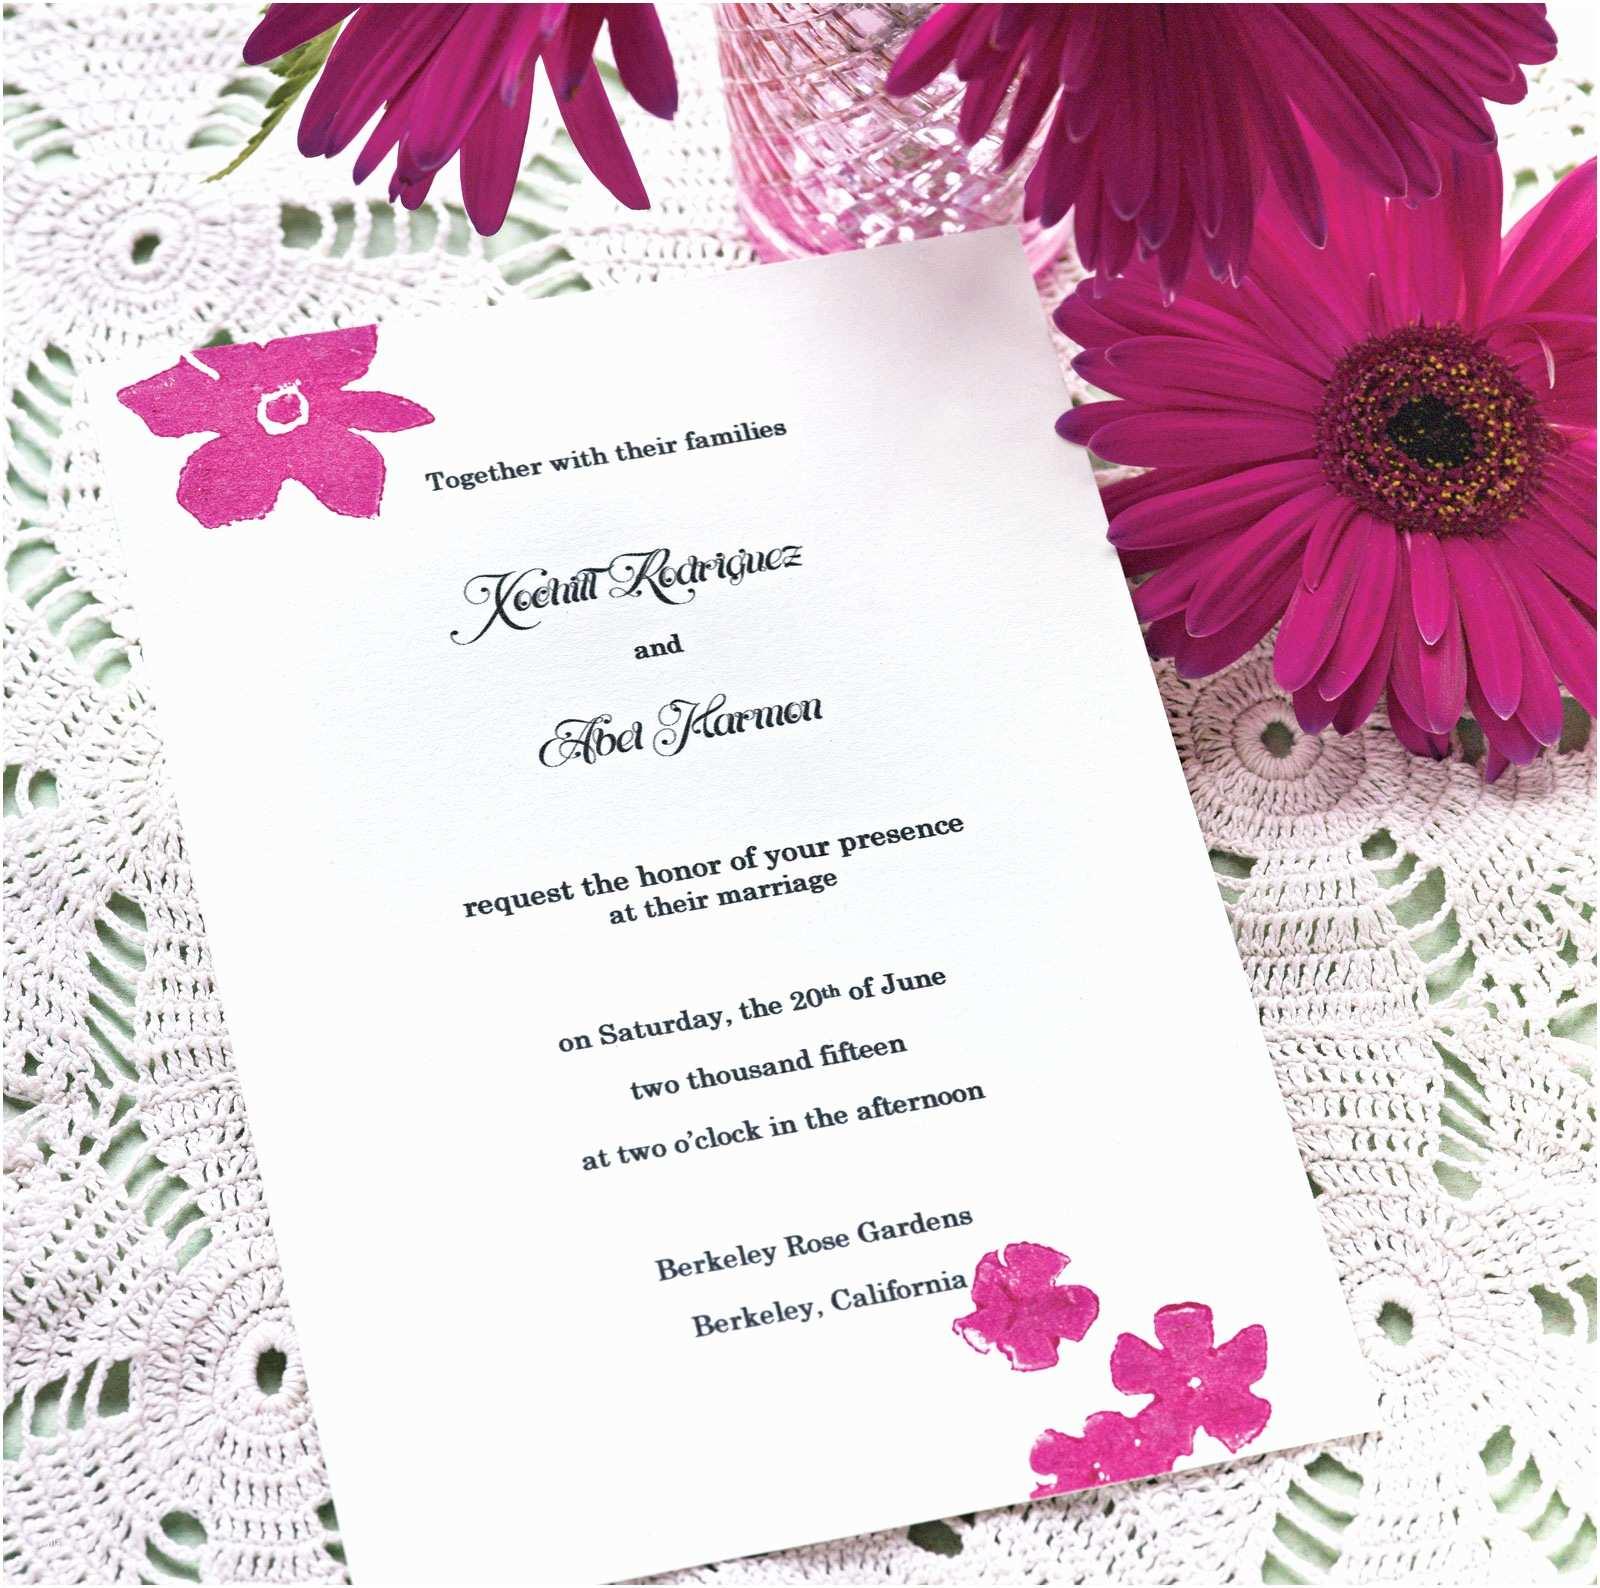 Wedding Invitation Cards 25 Creative Wedding Invitations